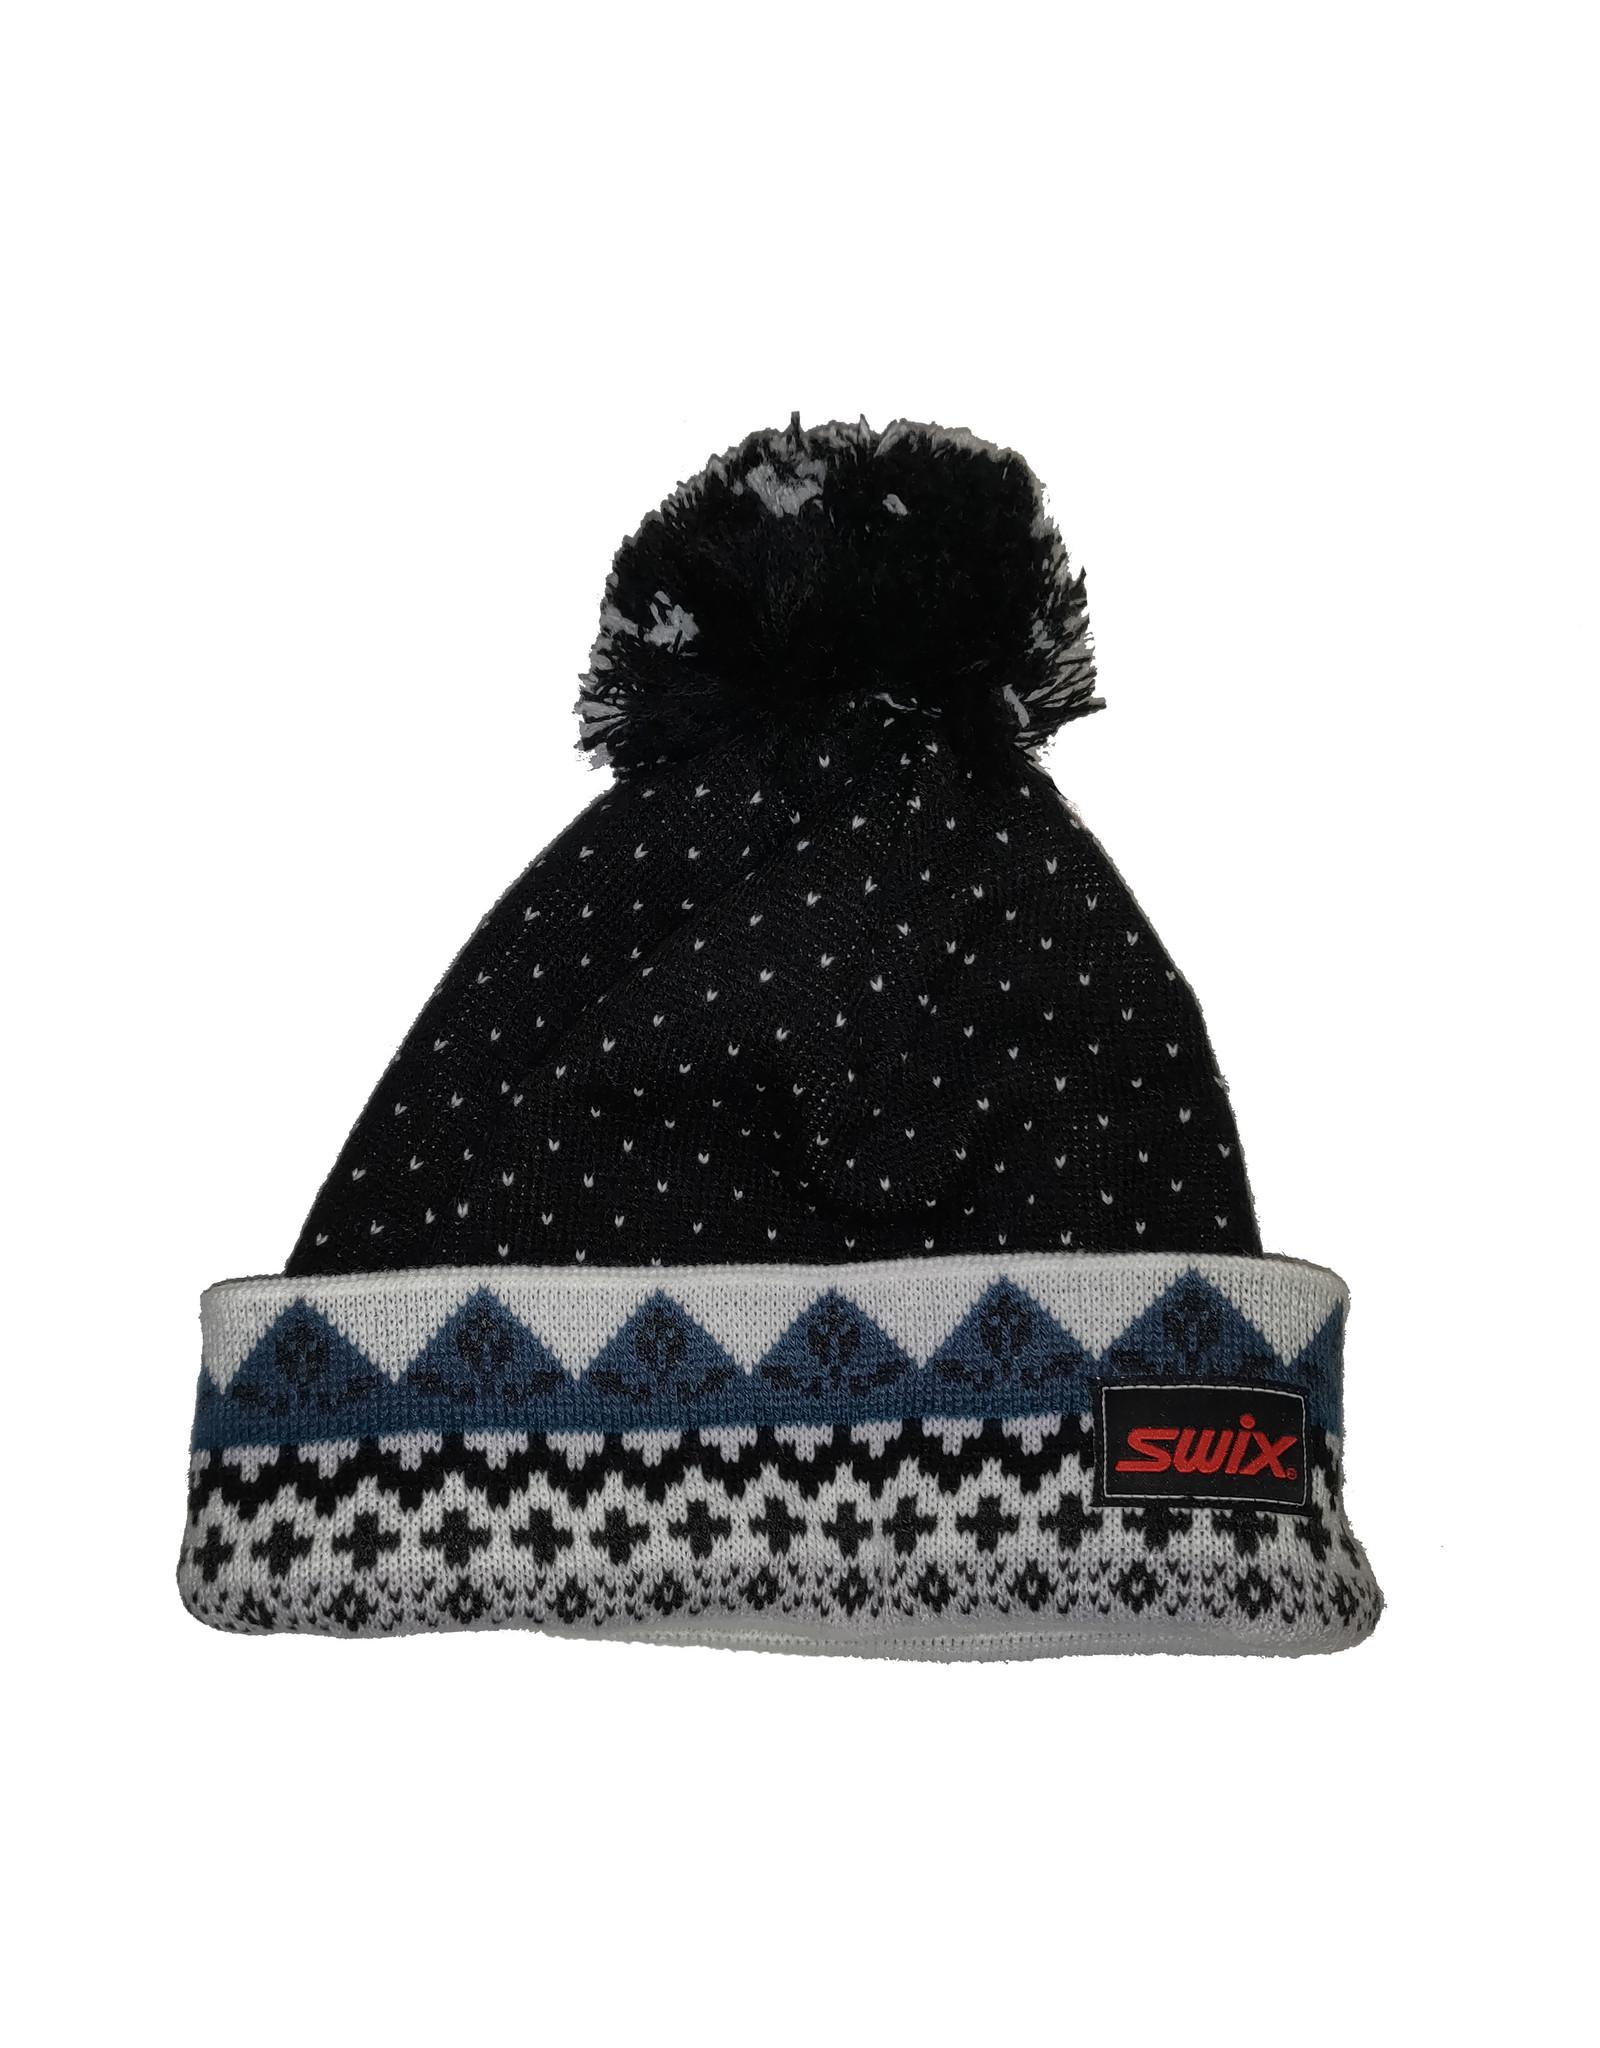 Swix Atwell Hat Black